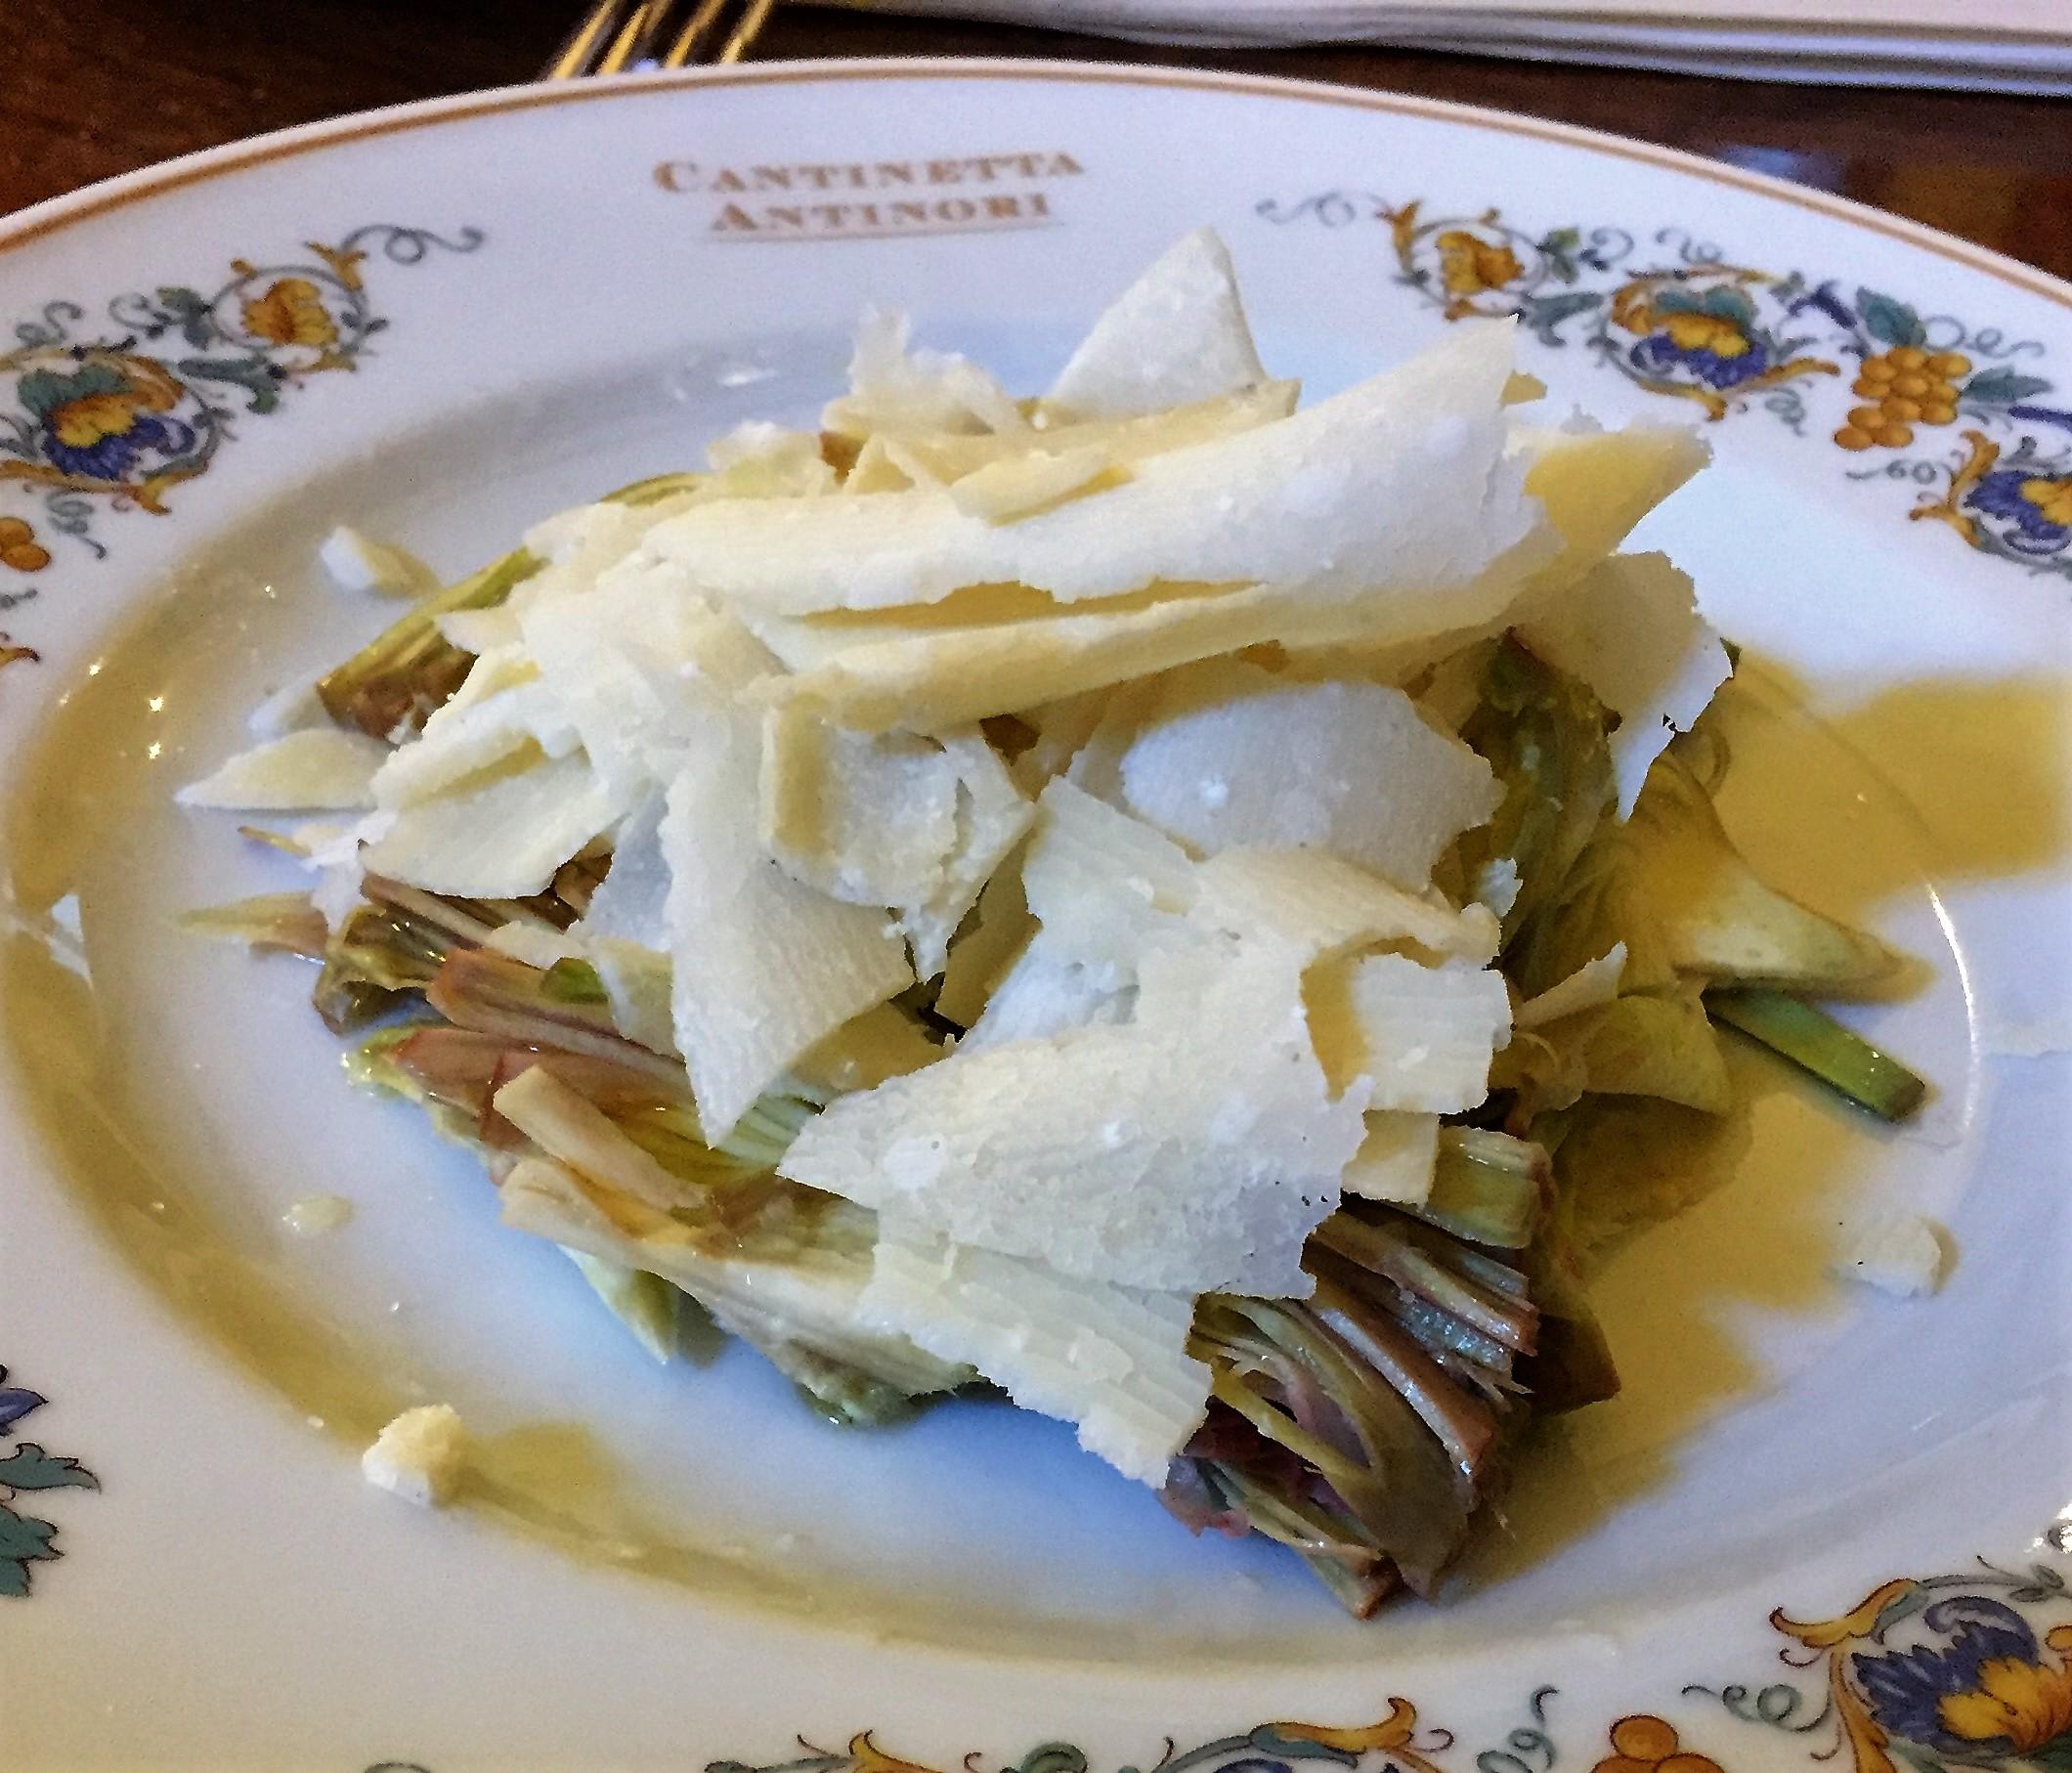 artichoke; parmesan; olive oil; florence; cantinetta antinori